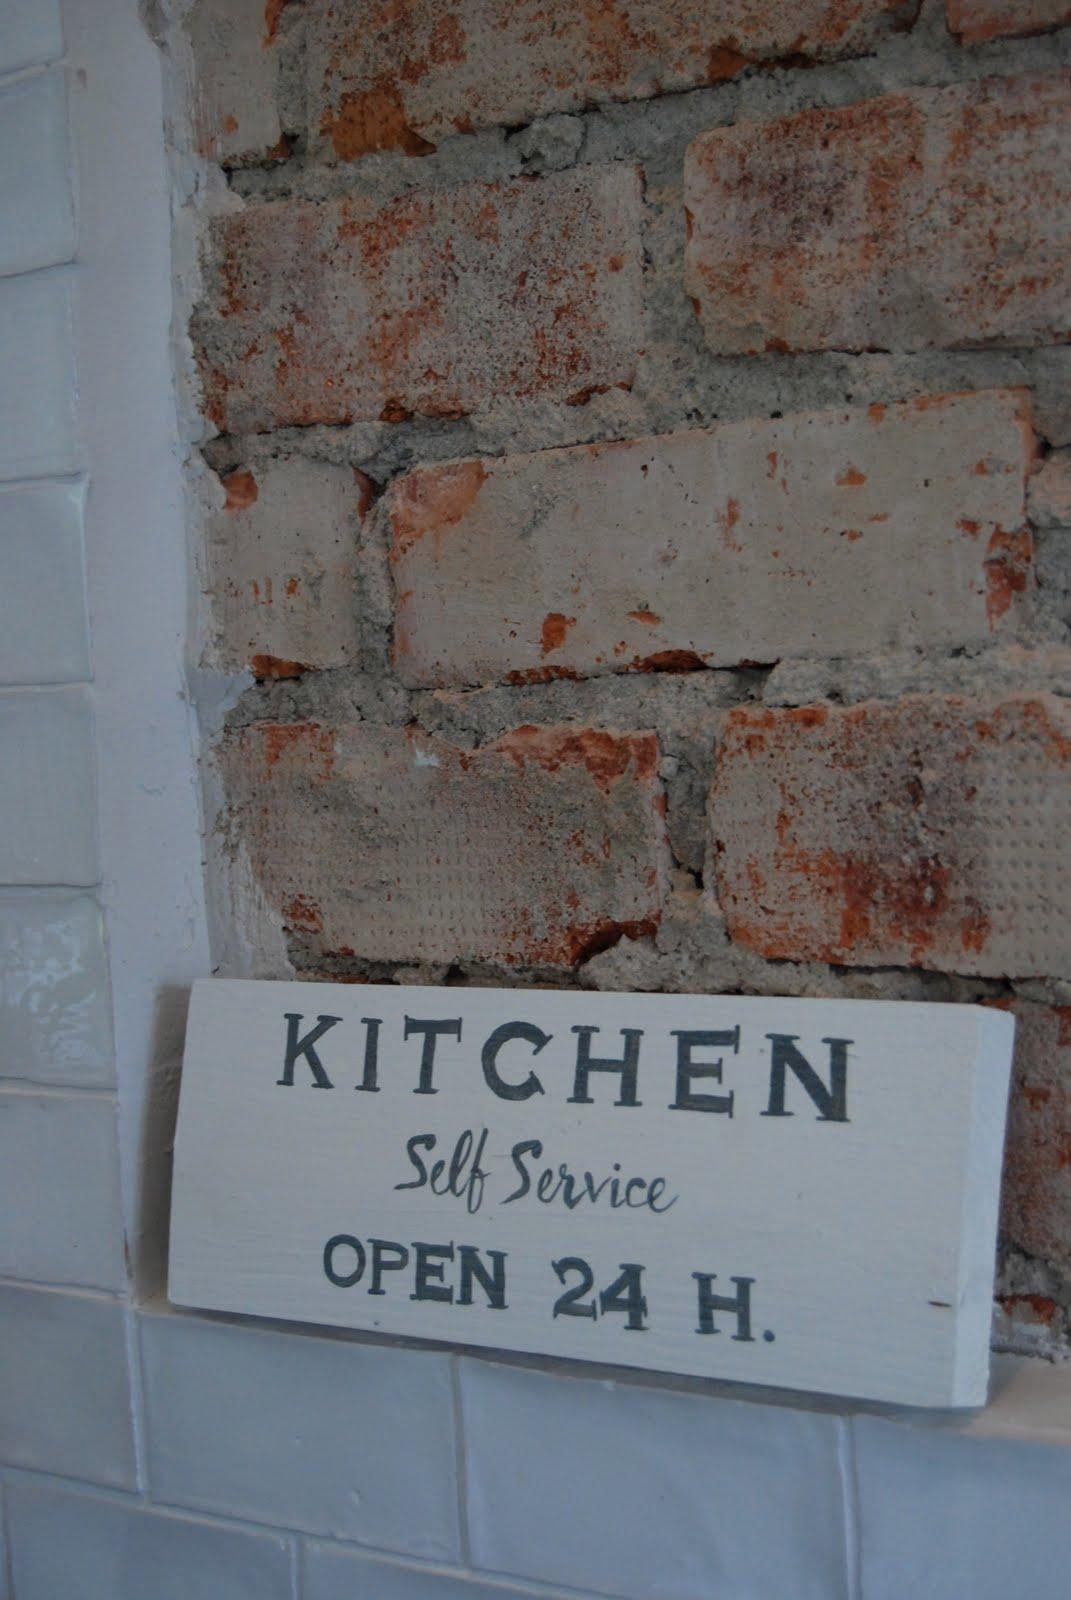 My shabby chic house: something is missing   inredningsutmaning!